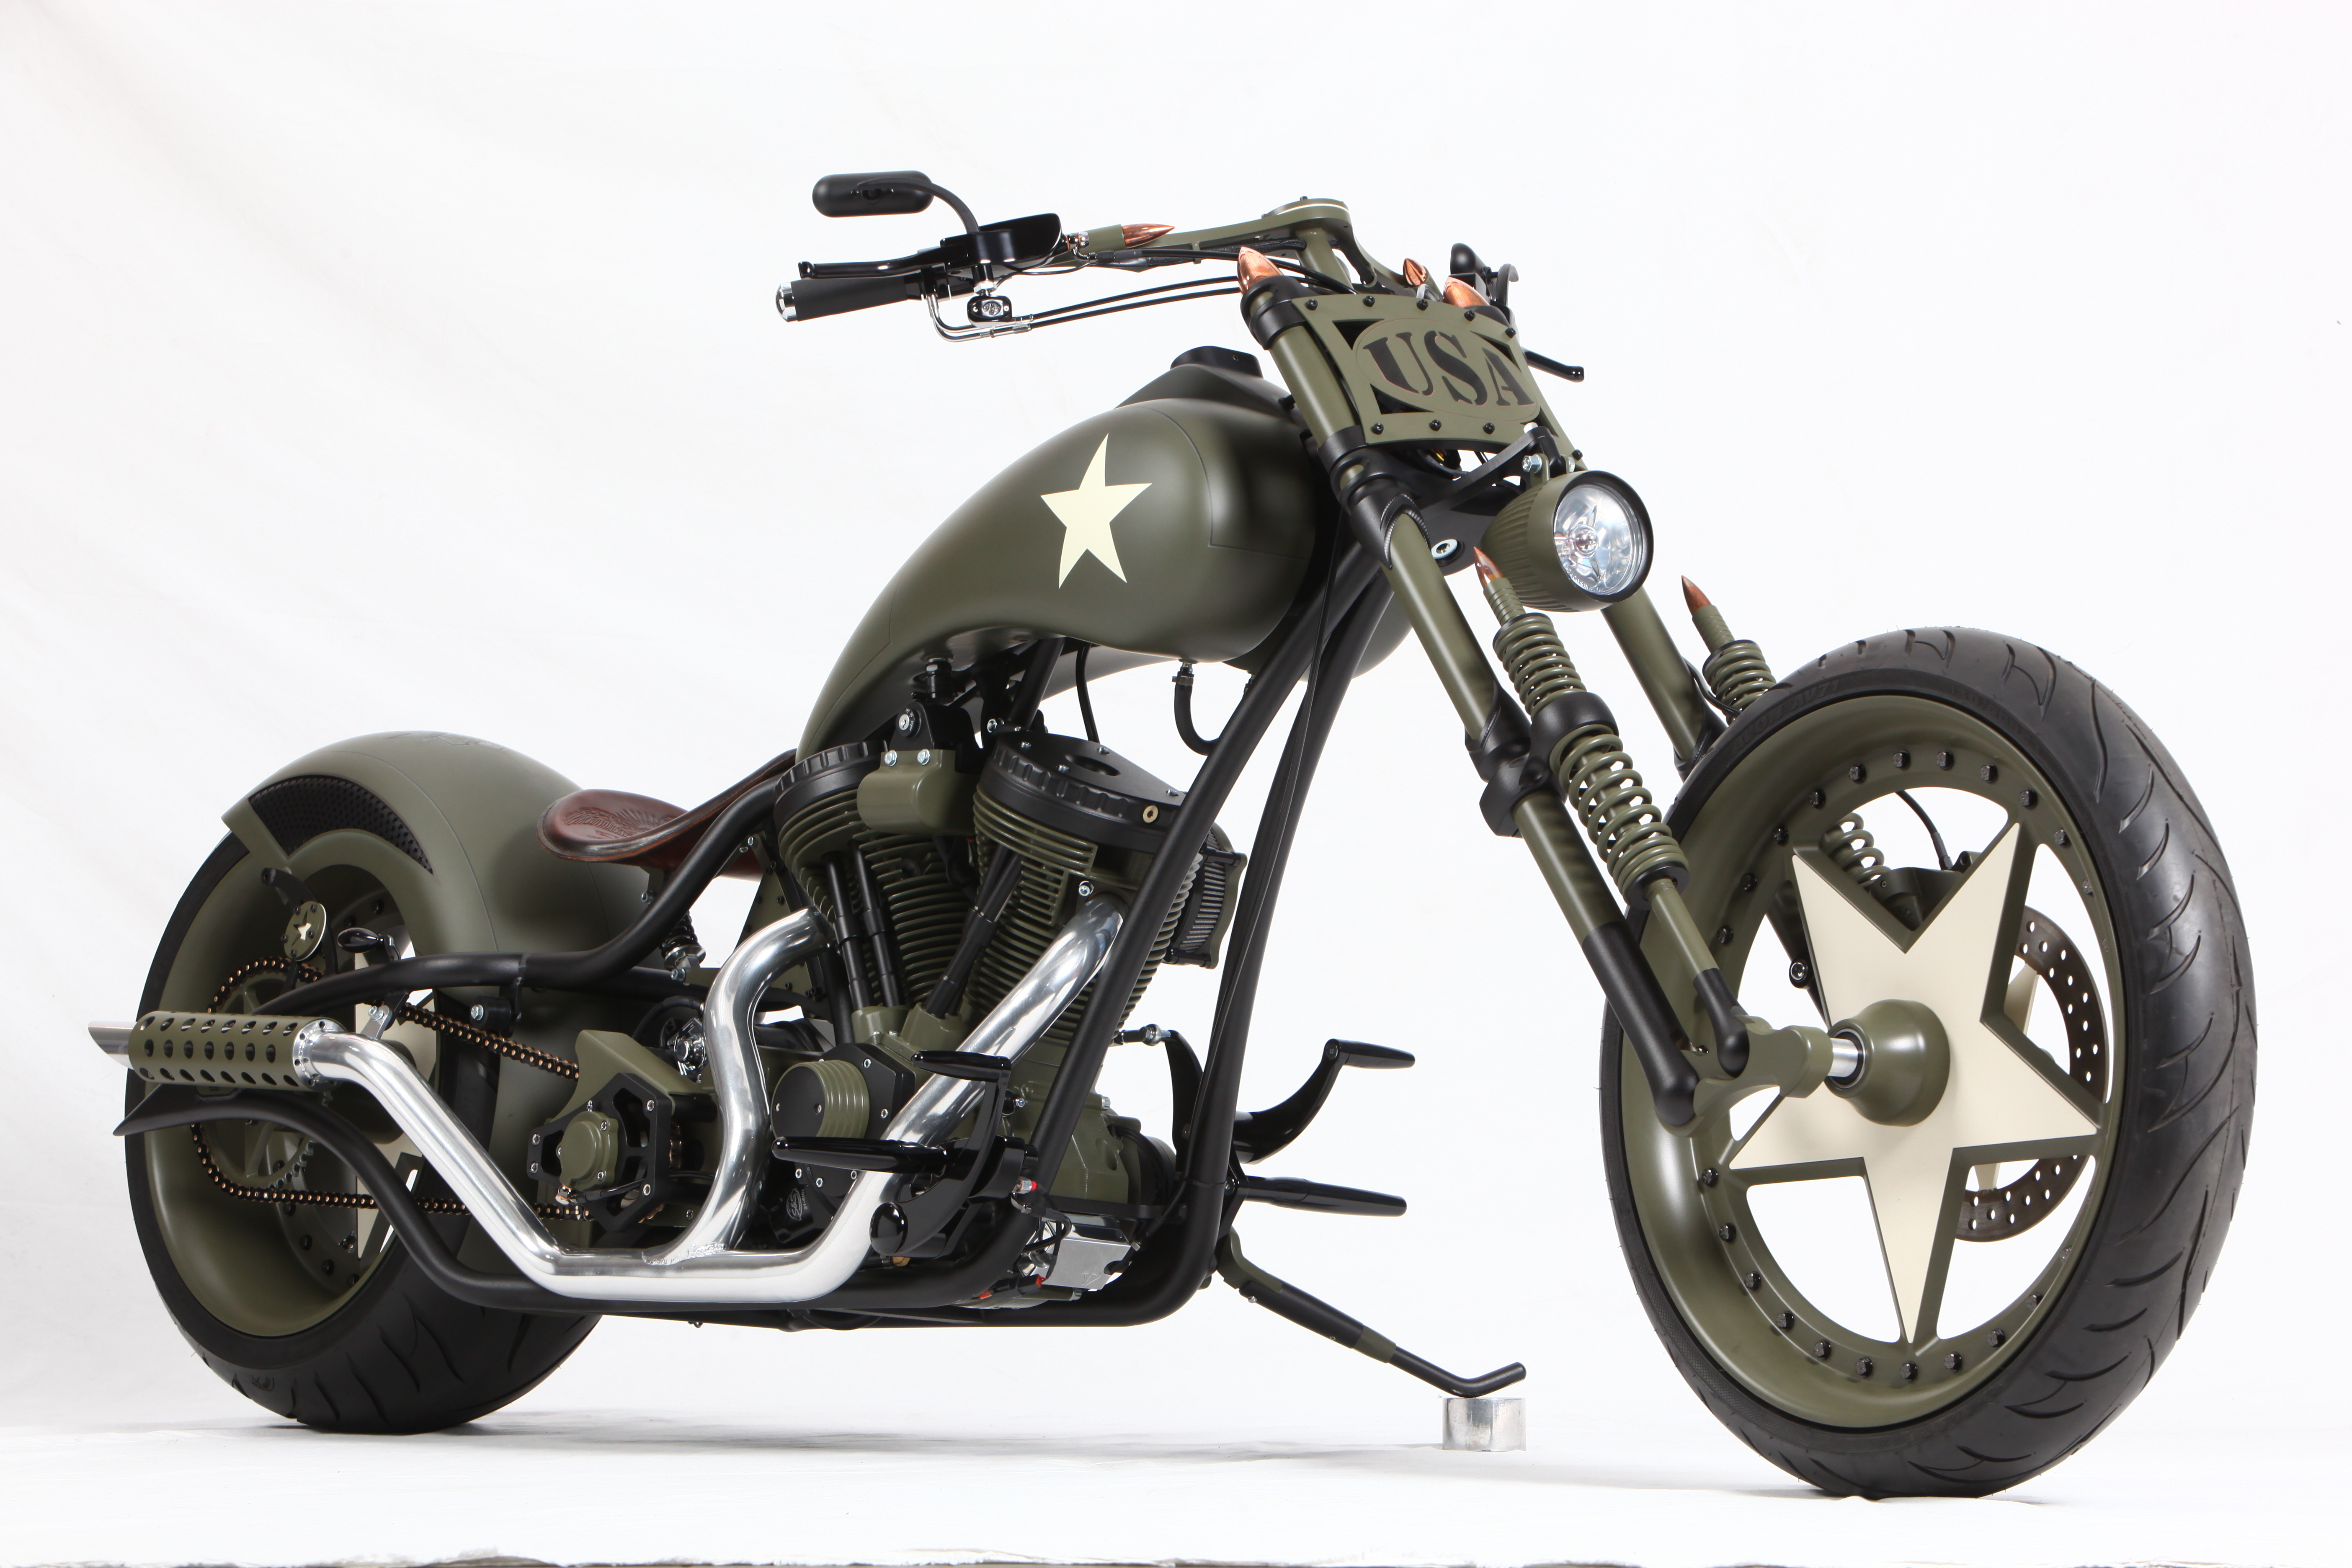 CUSTOM CHOPPER motorbike tuning bike hot rod rods military 5616x3744